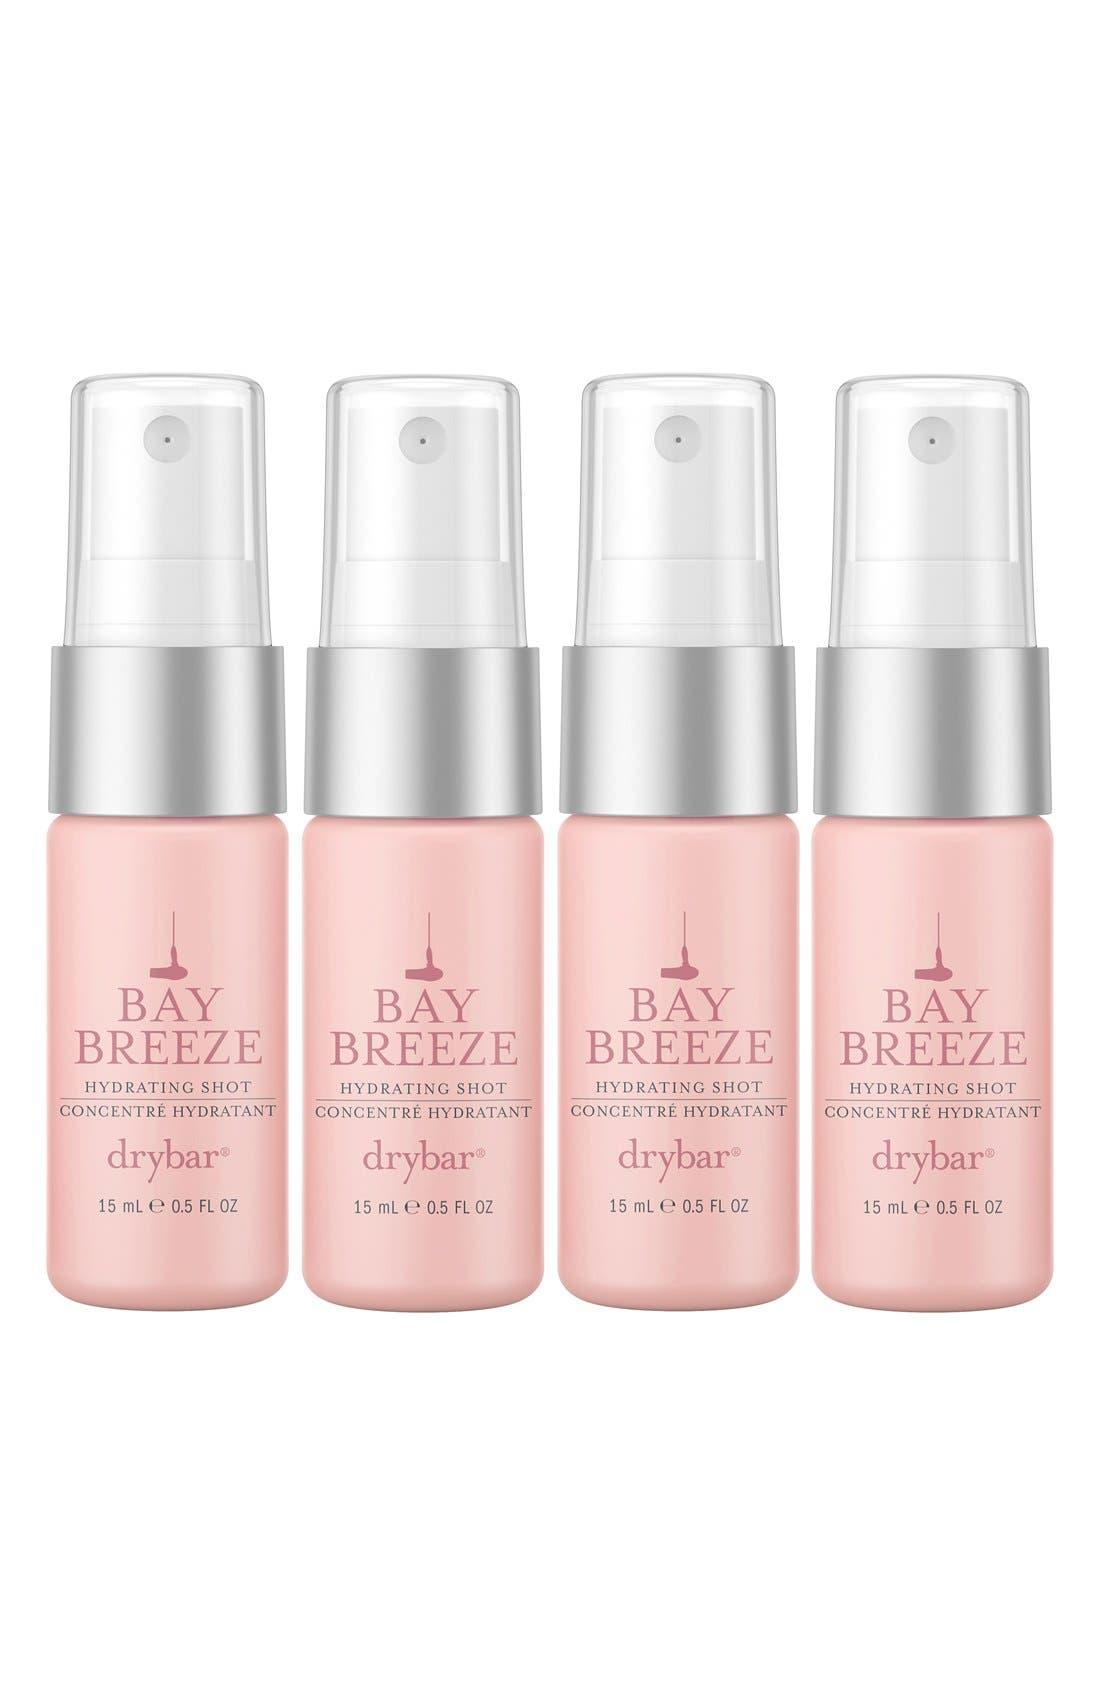 Drybar 'Bay Breeze' Hydrating Shots (Set of 4)